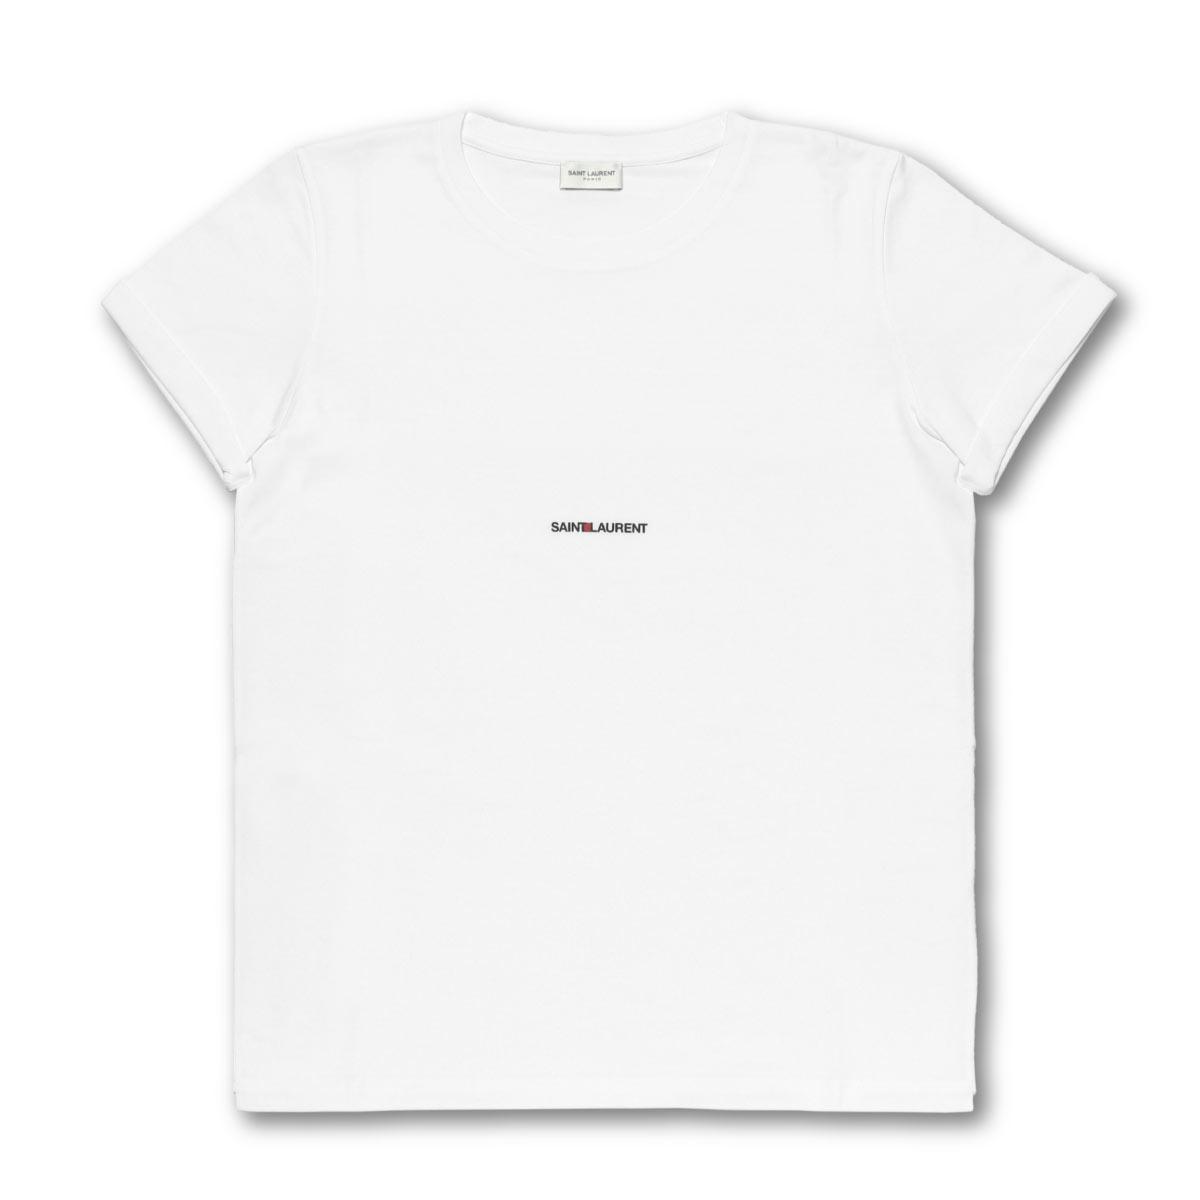 f4e9803b 464572 Saint-Laurent SAINT LAURENT T-shirt men YB2DQ 9000 short sleeves T-  ...